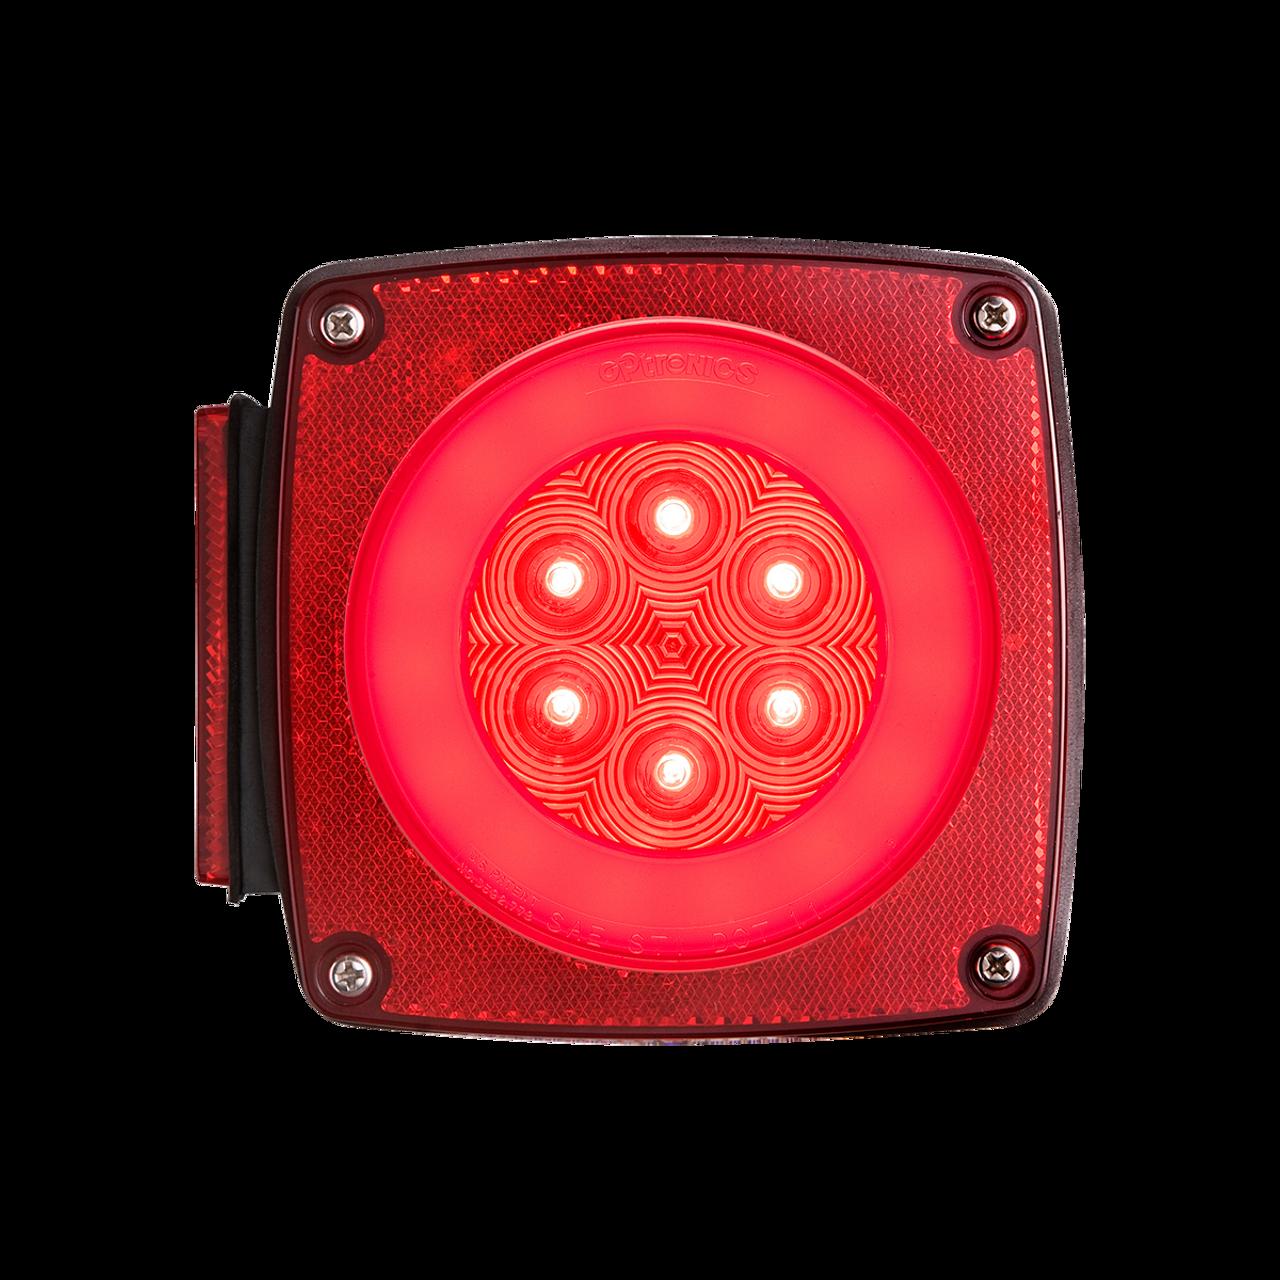 STL109RBP --- Glolight LH Square Sealed LED Red Stop/Turn/Tail Light